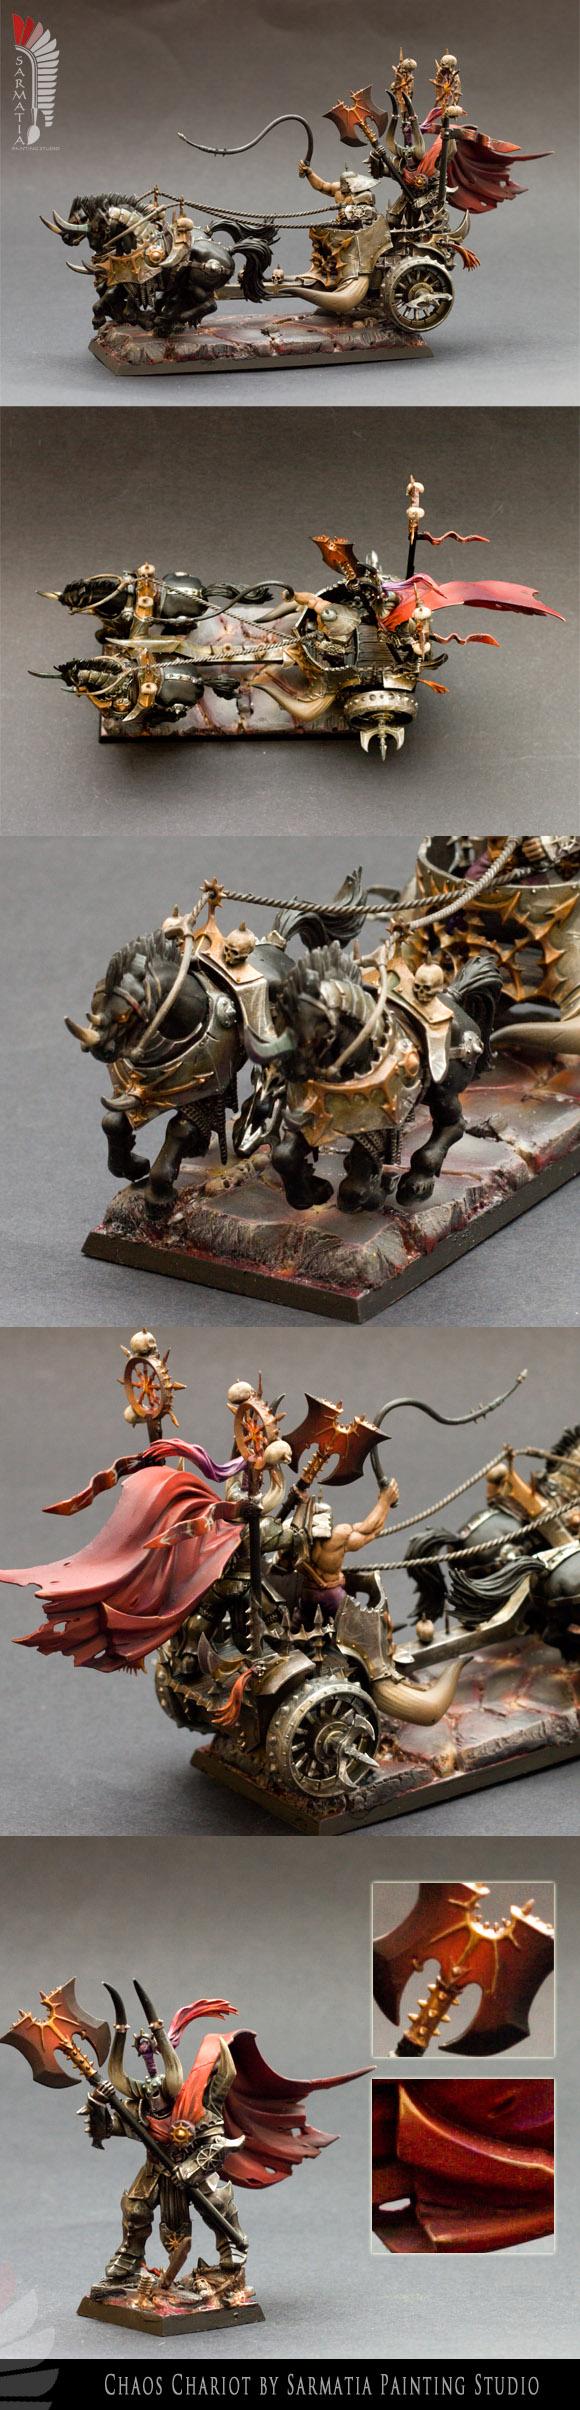 chaos_chariot_min